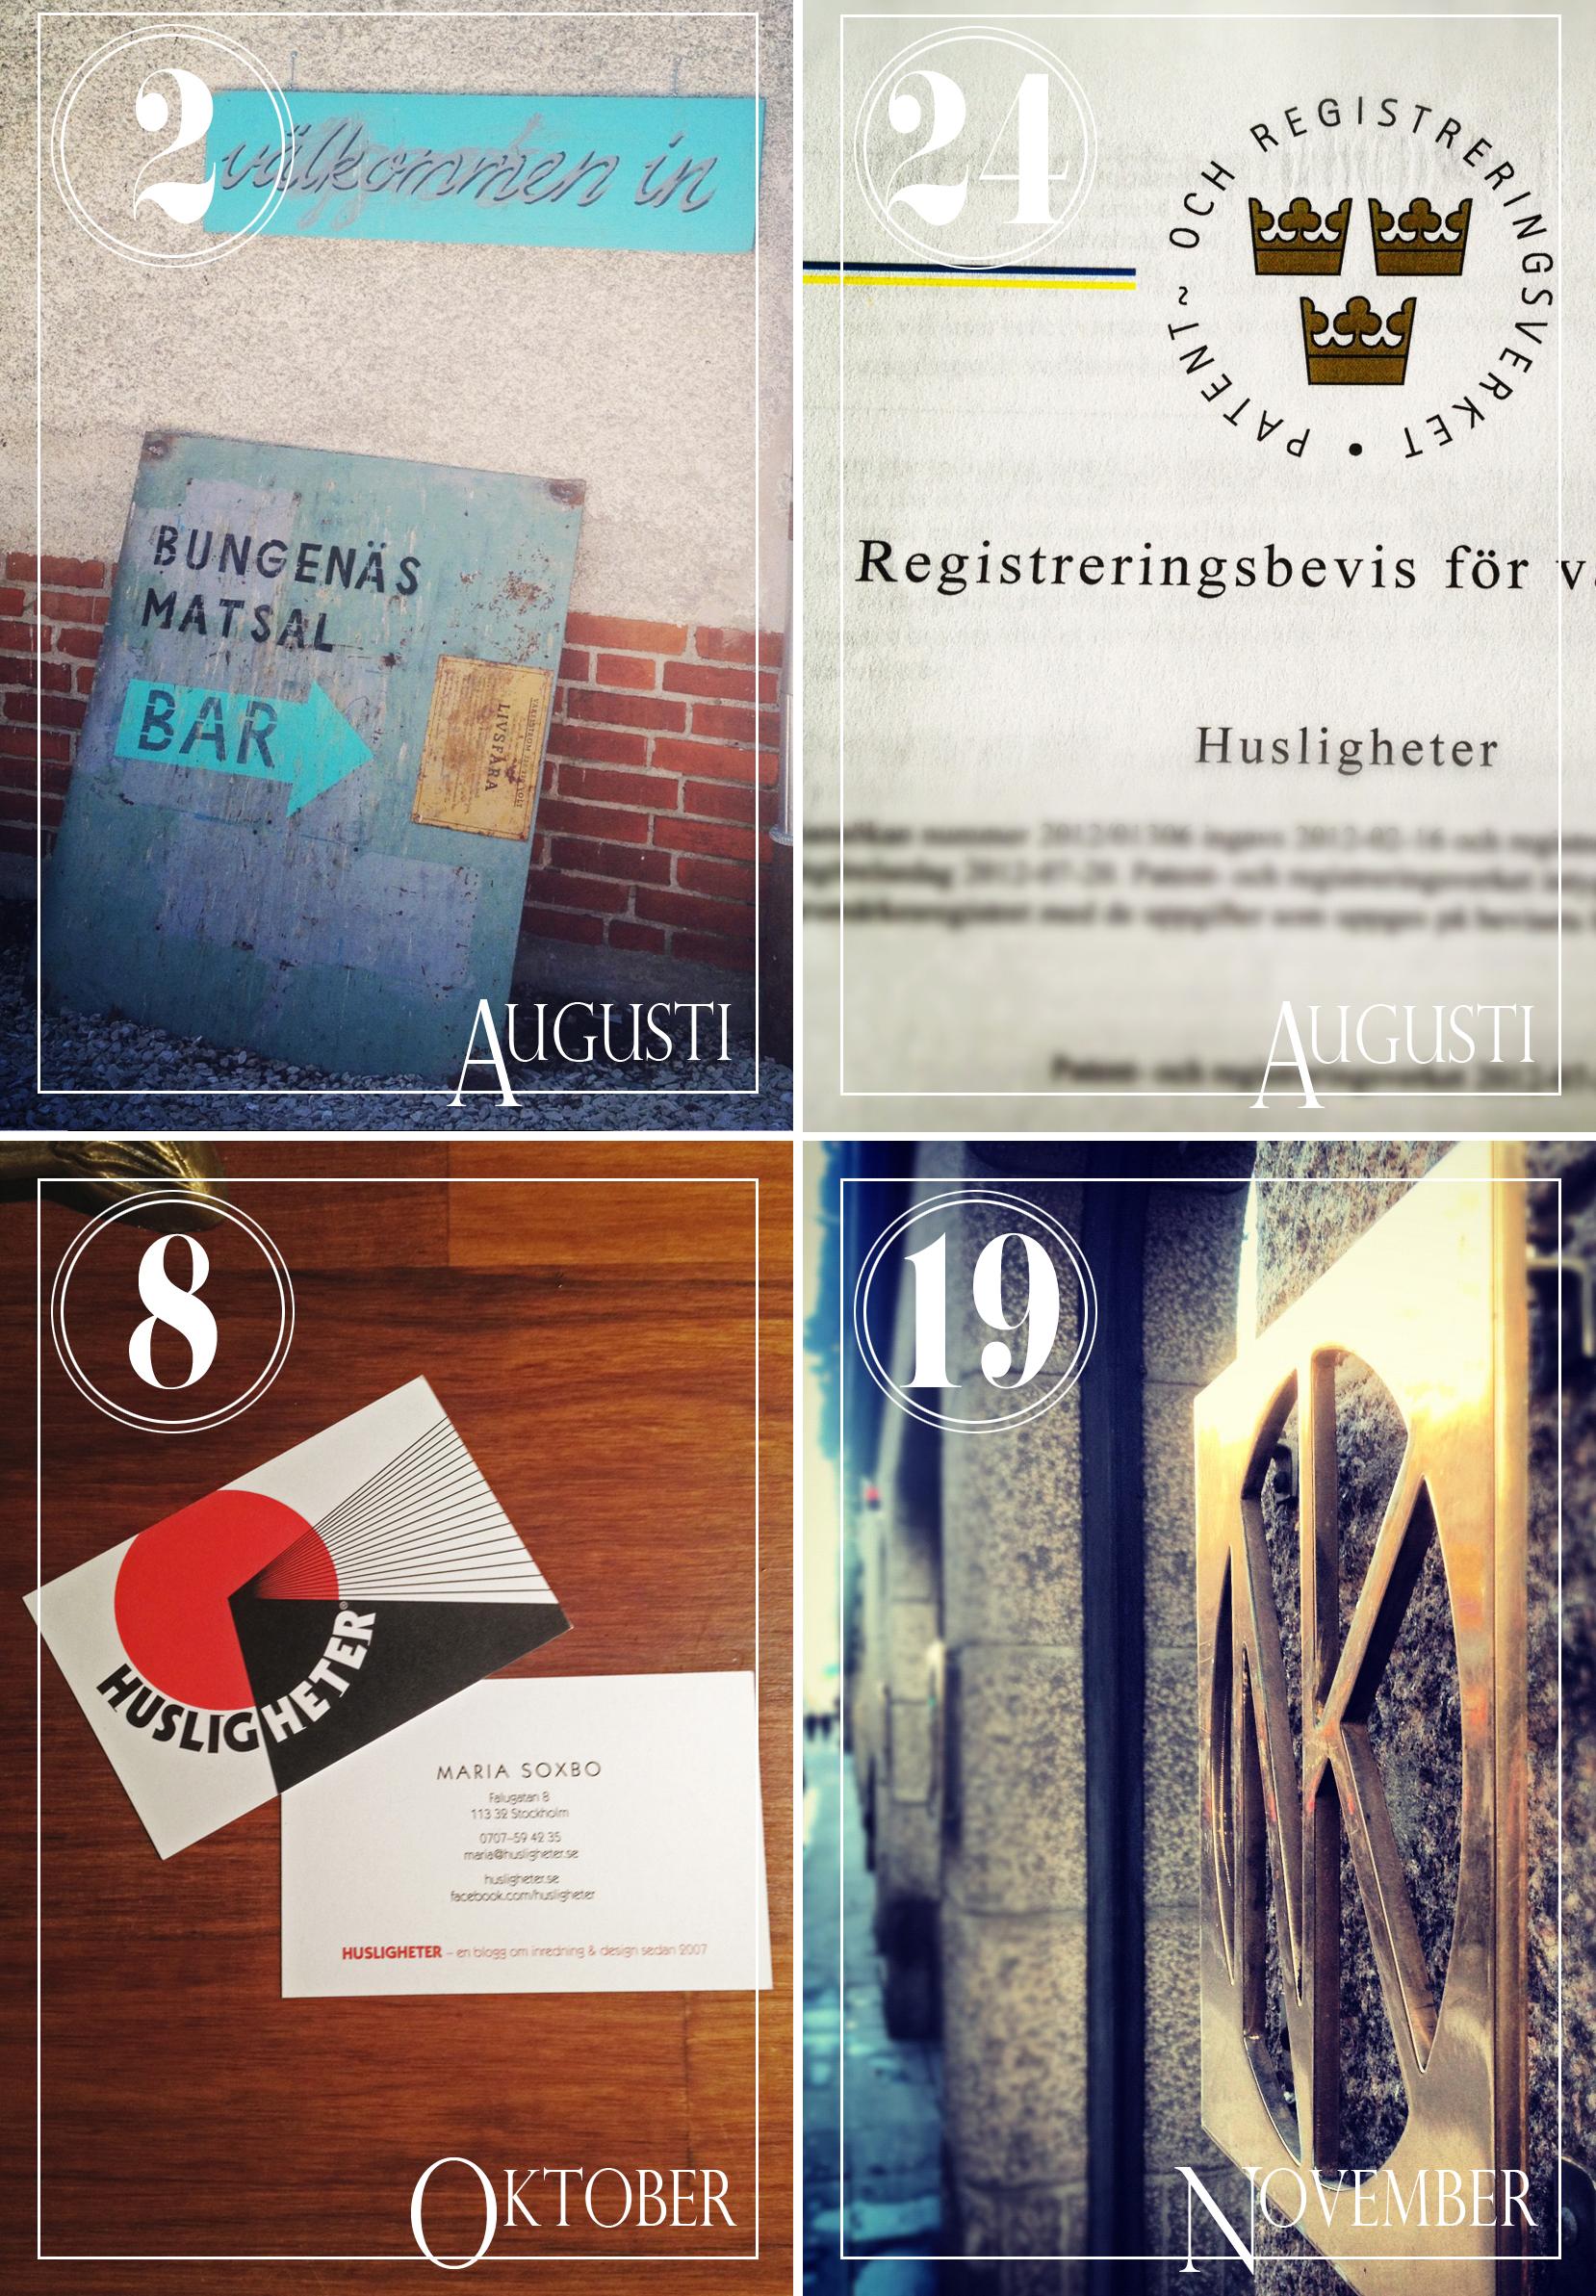 Work achievements 2012 – Husligheter.se